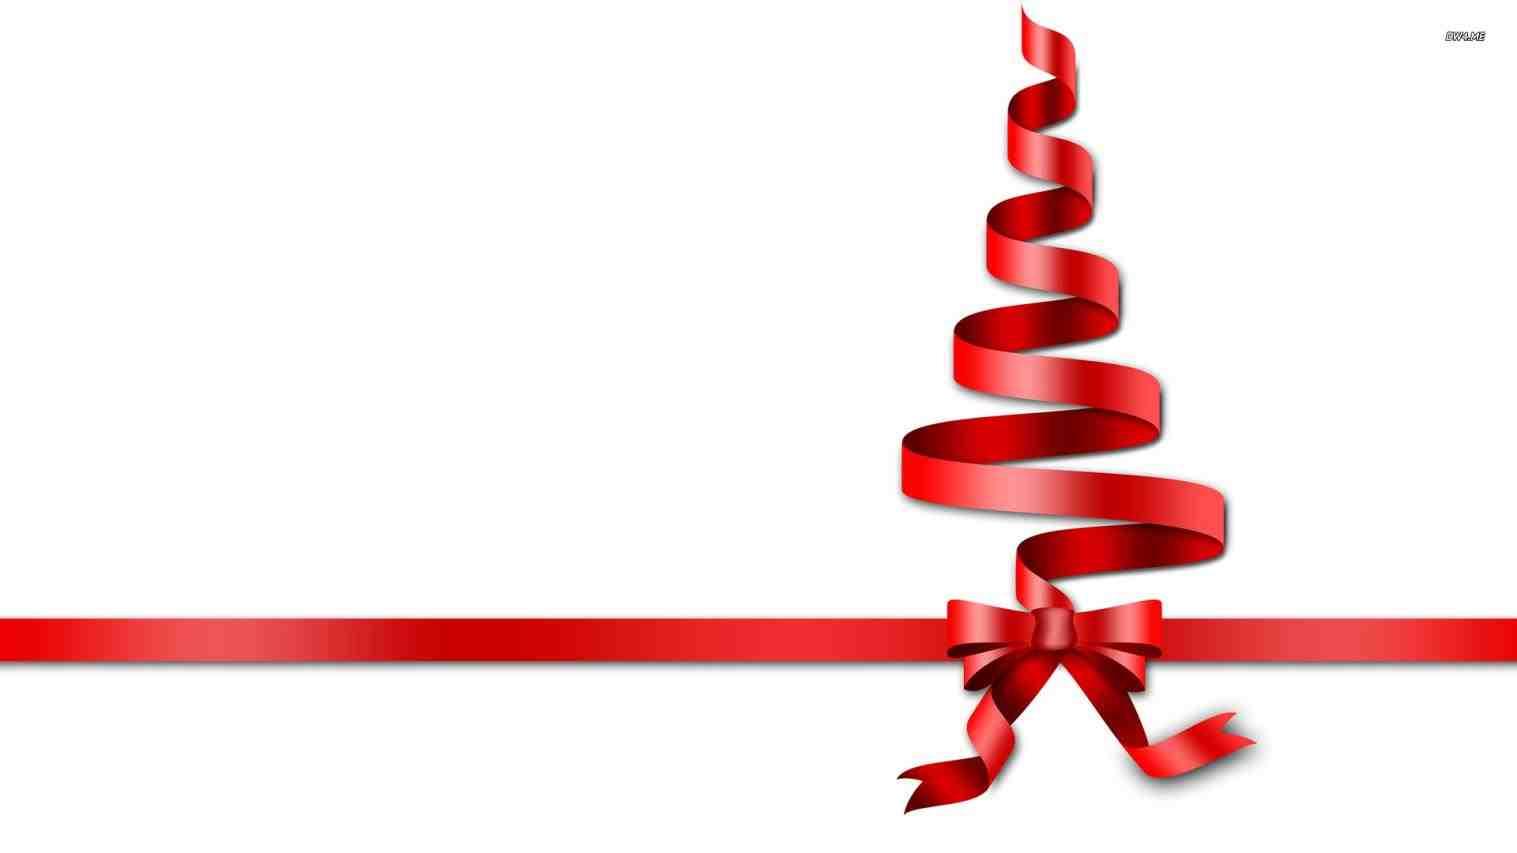 1517x853 Christmas Present Border Clipart Cheminee.website